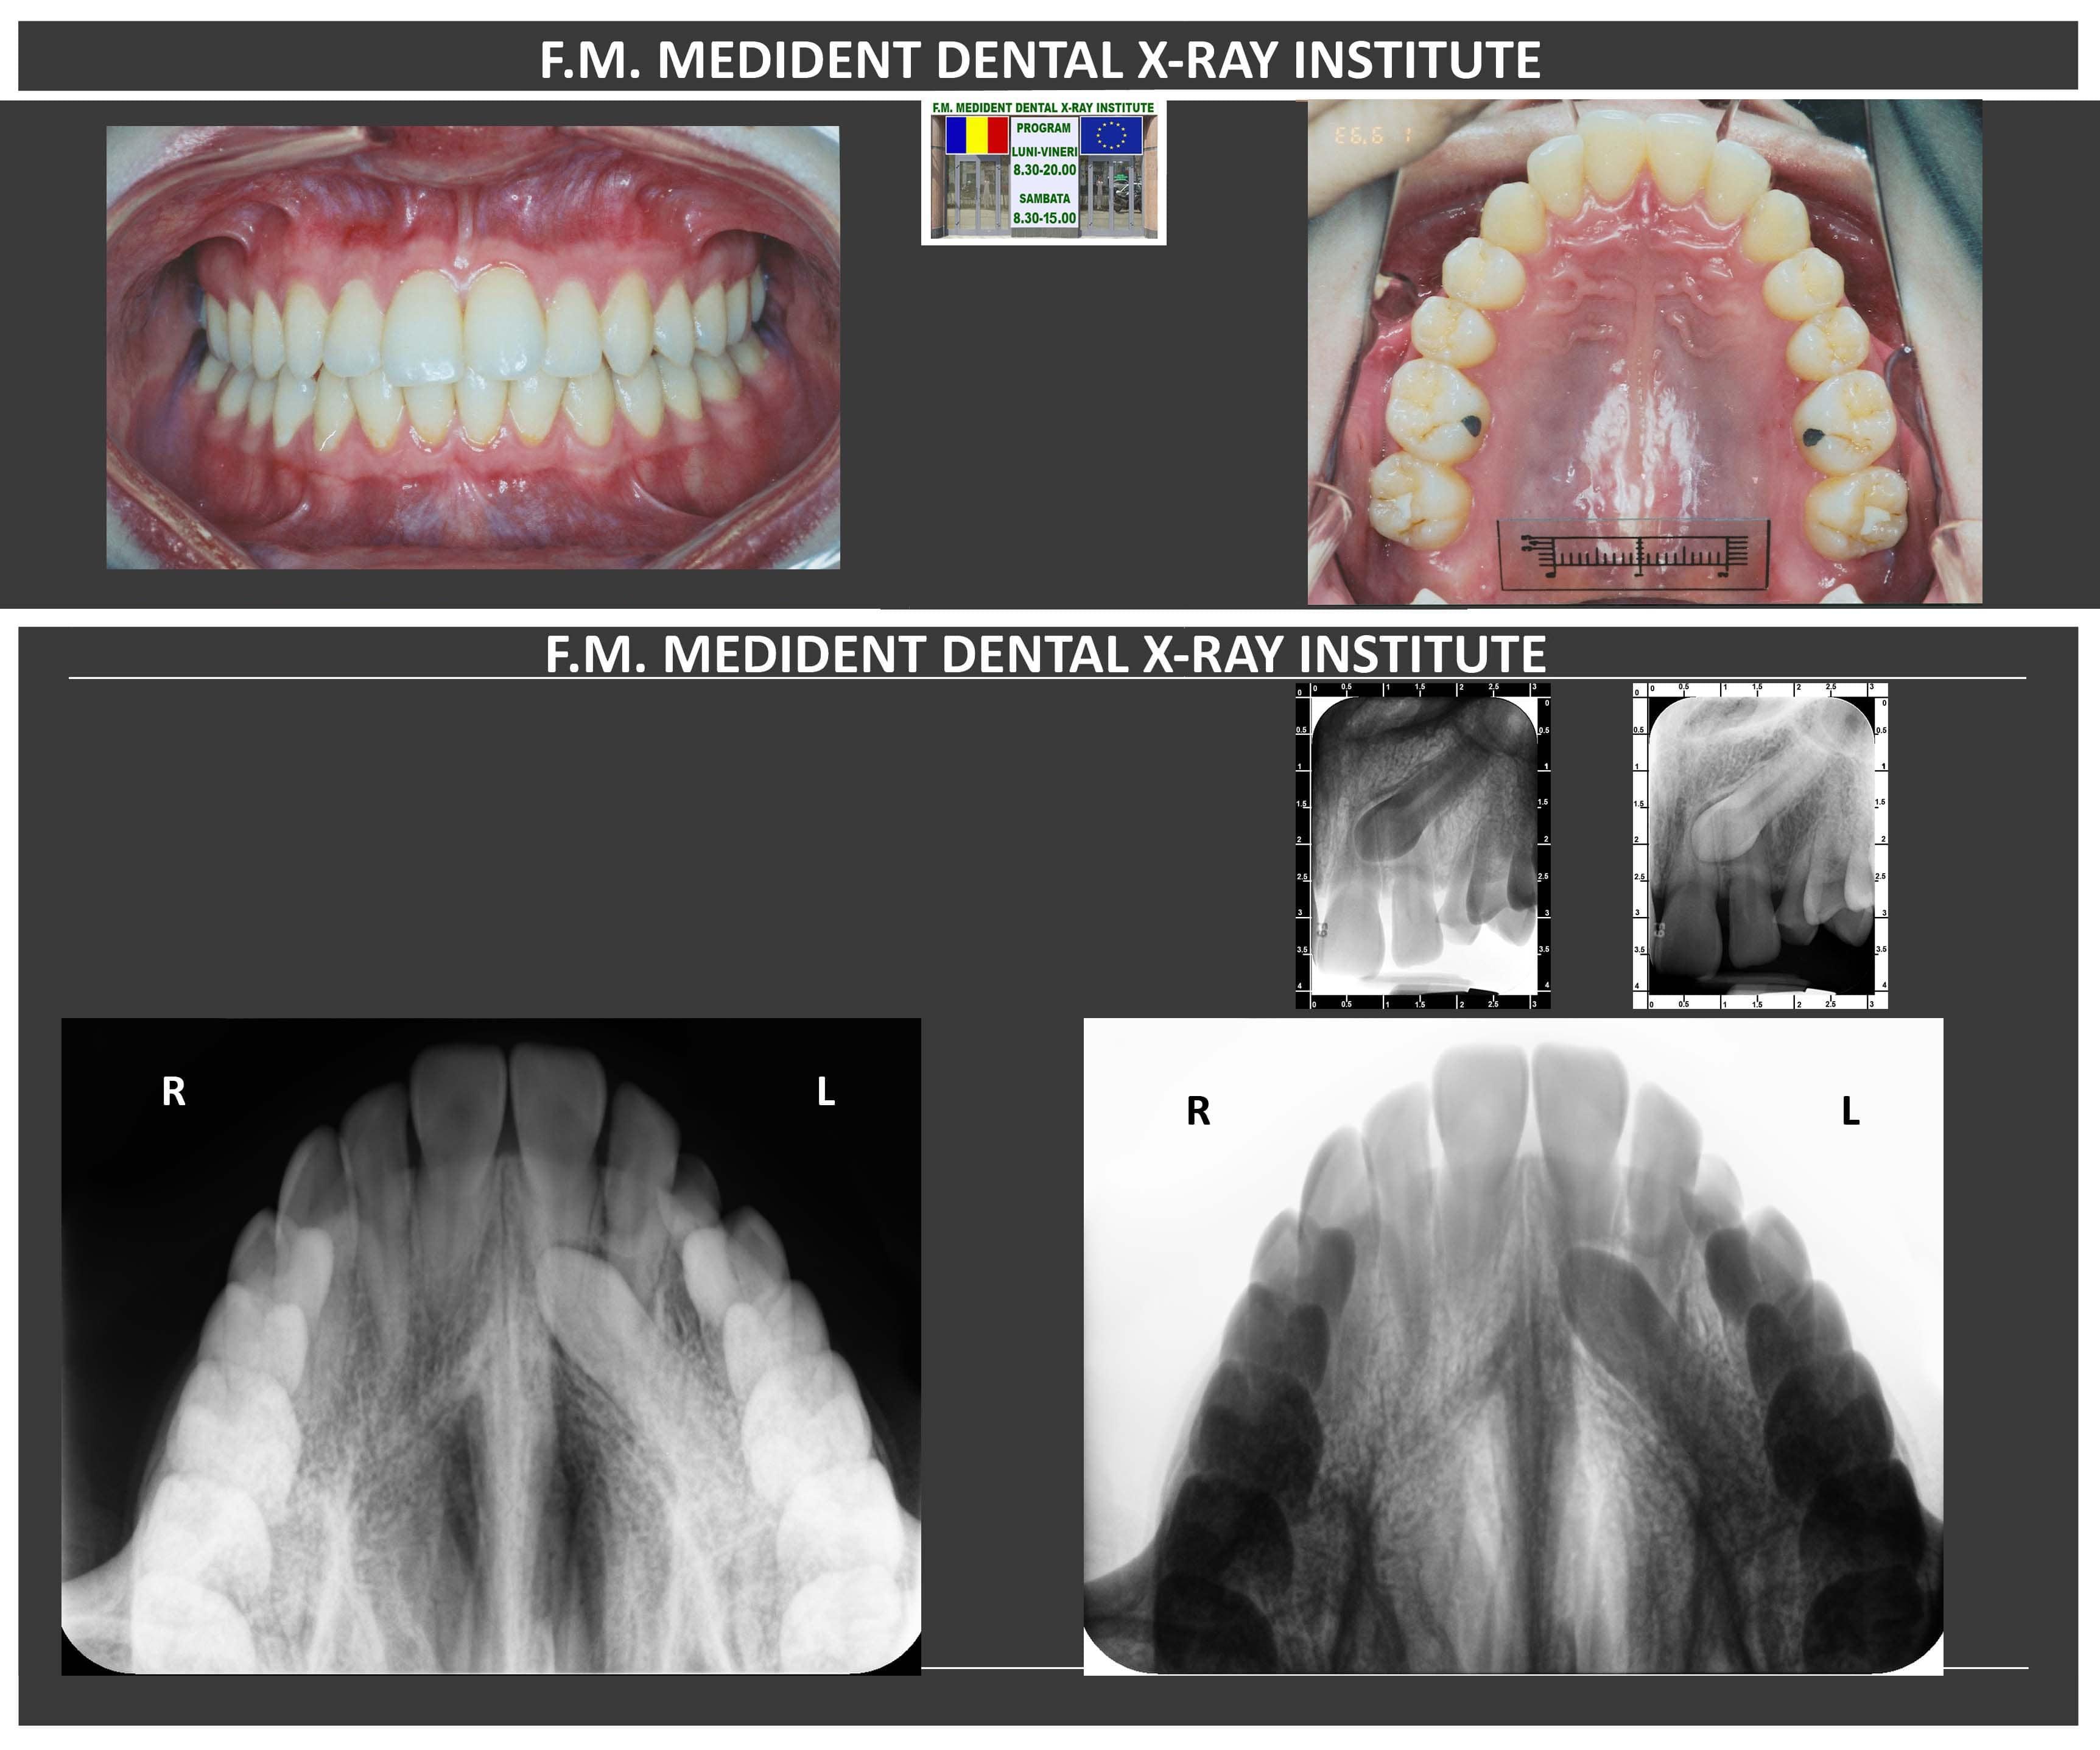 F.M. Medident - Xray for treatment